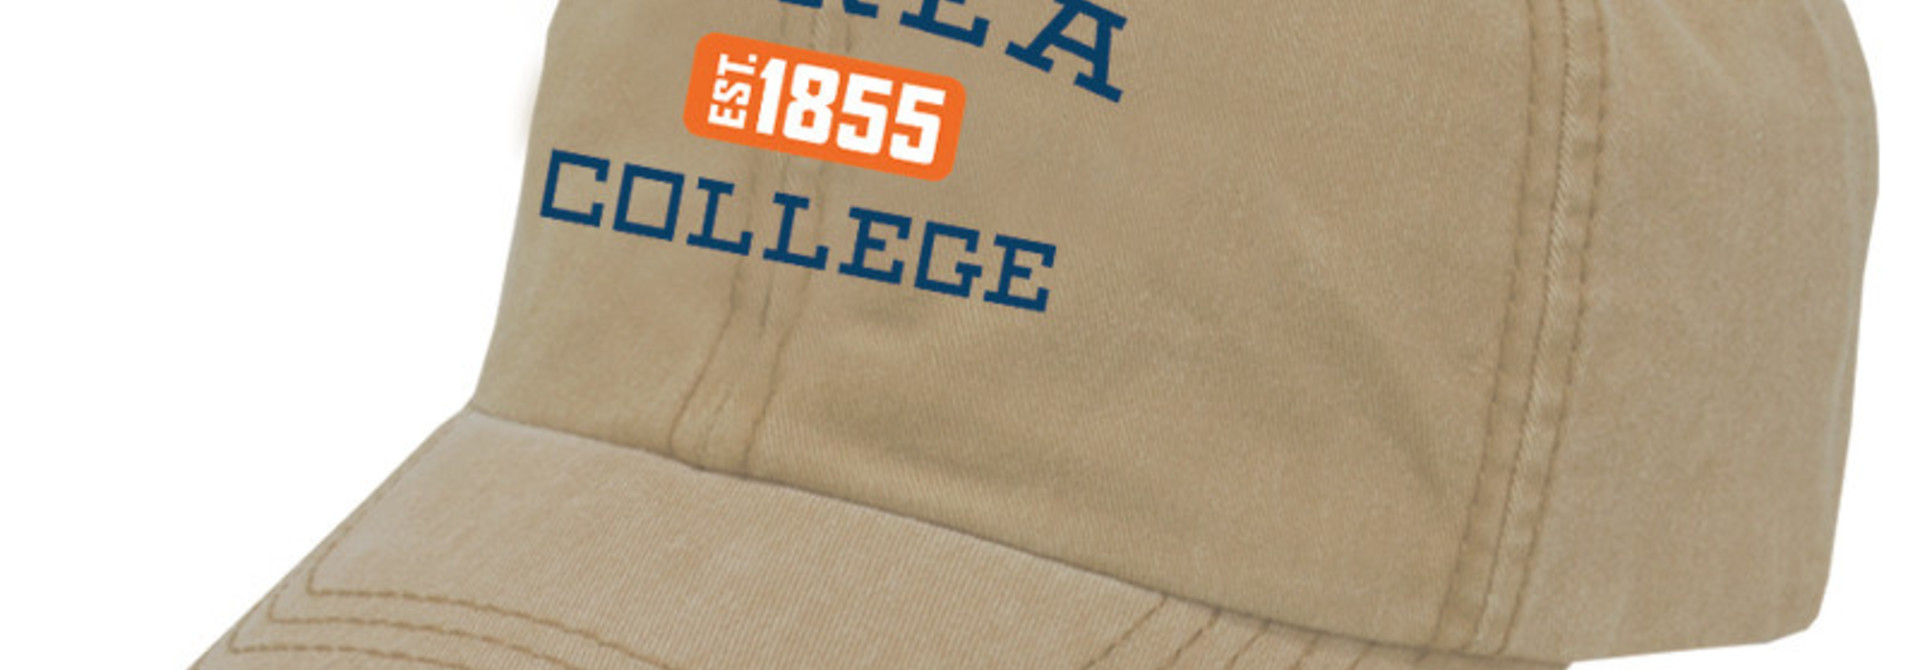 Berea College 1855 Ball Cap